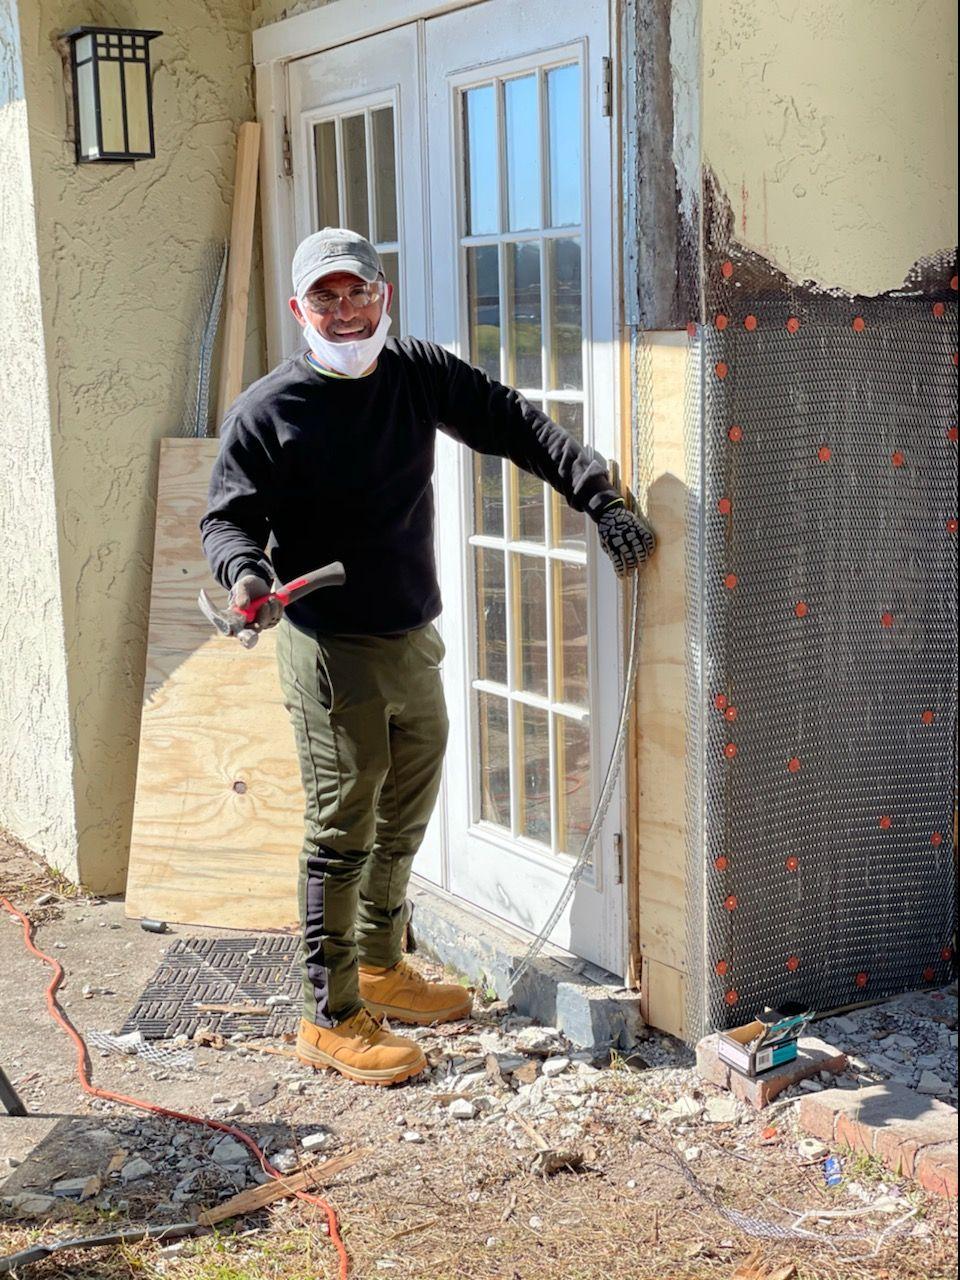 Exteriors walls repair, painting whole property